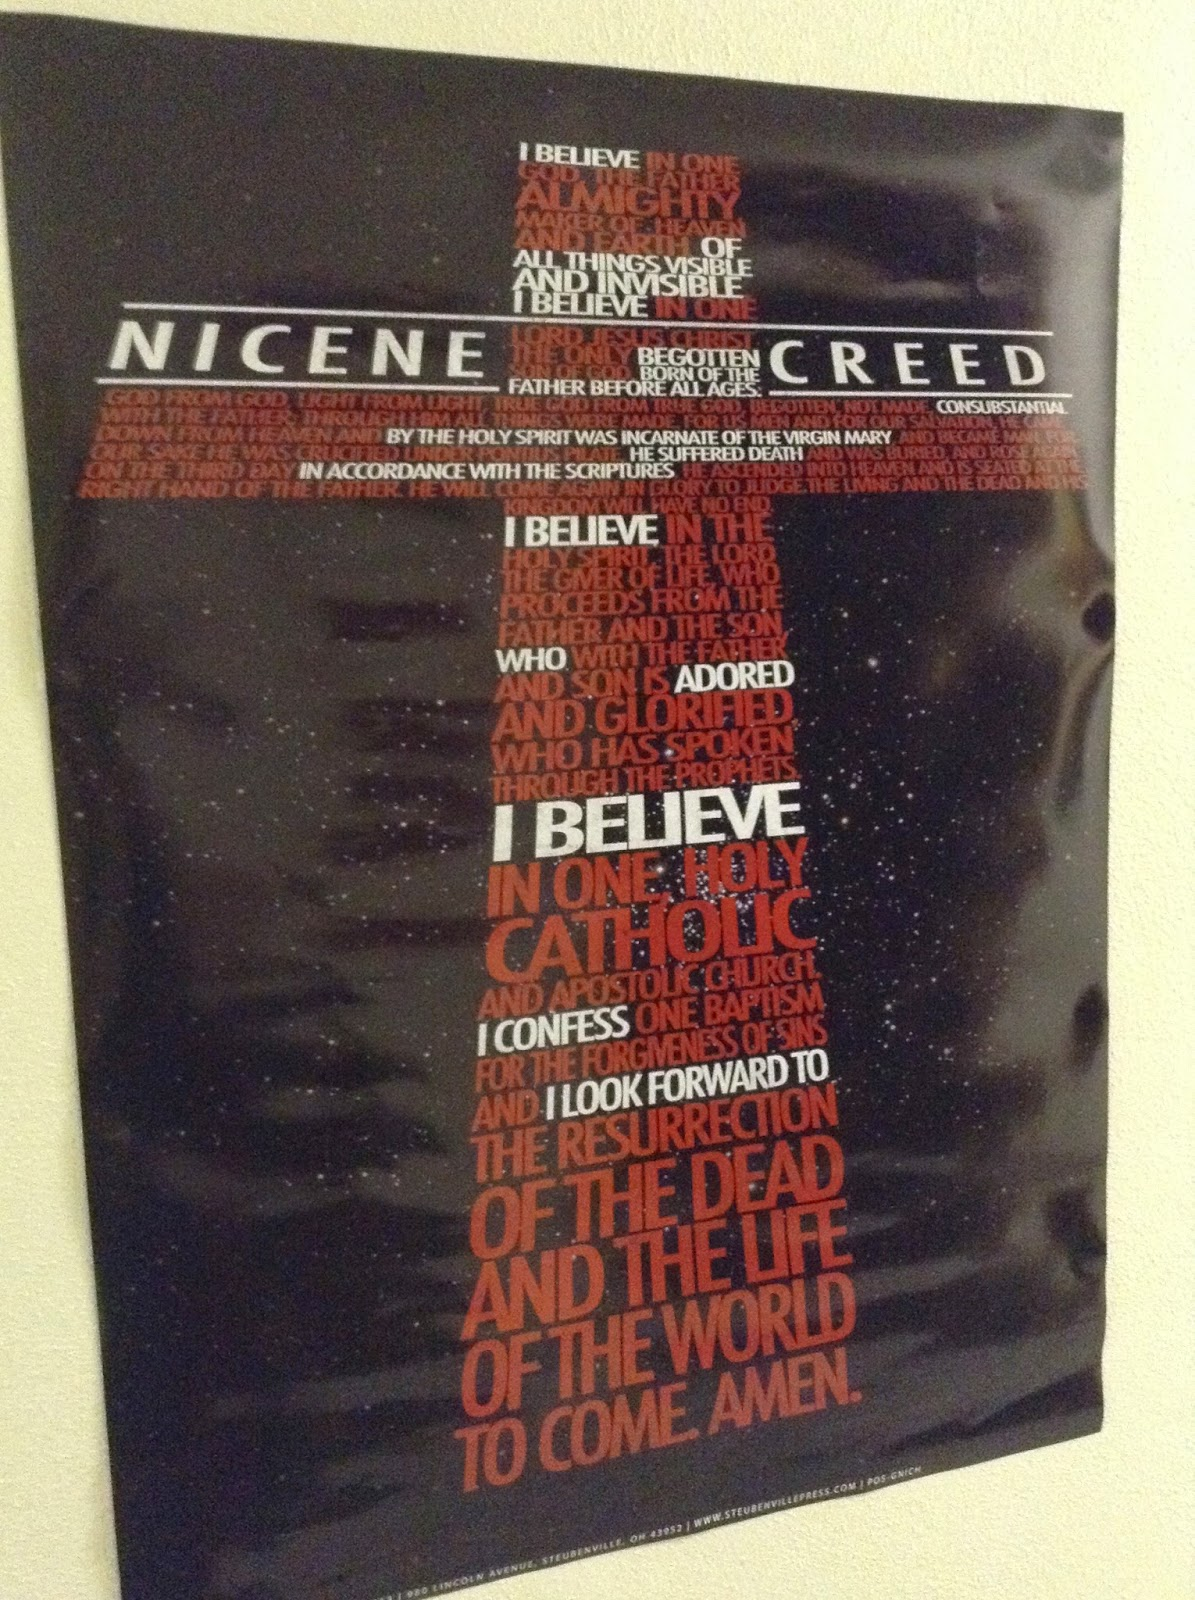 http://www.steubenvillepress.com/new-nicene-creed-poster/